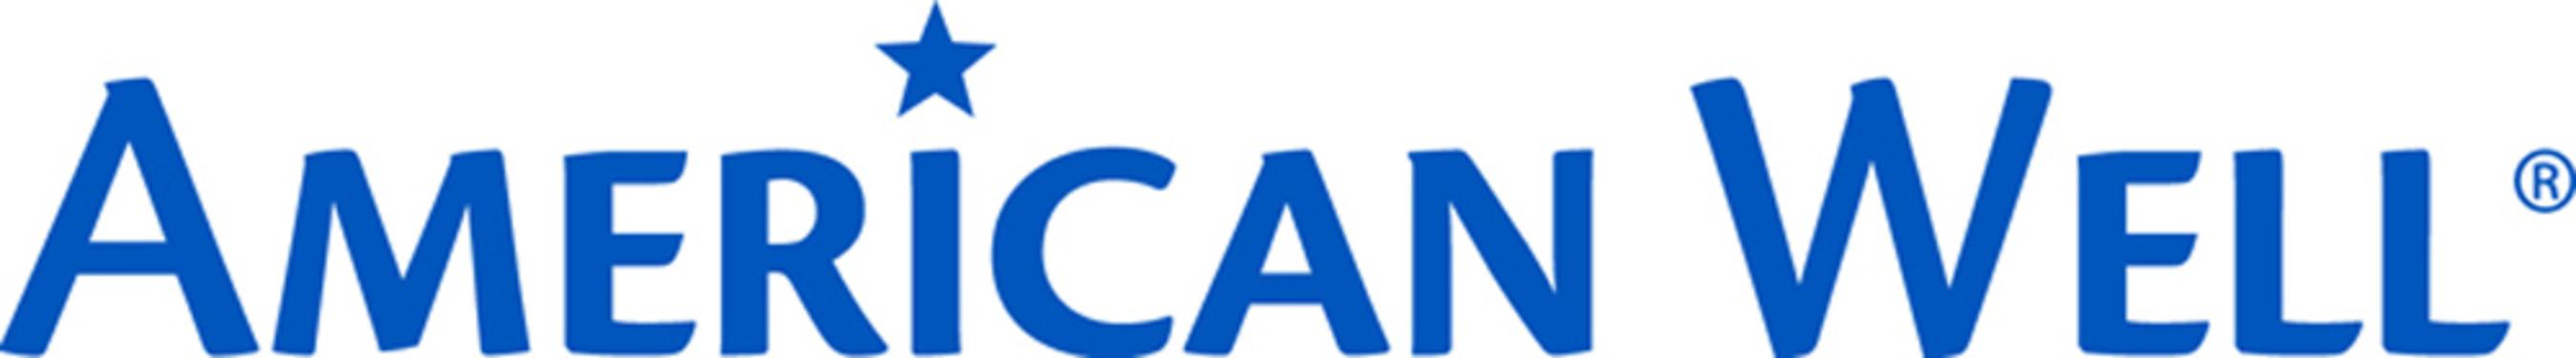 American Well logo.